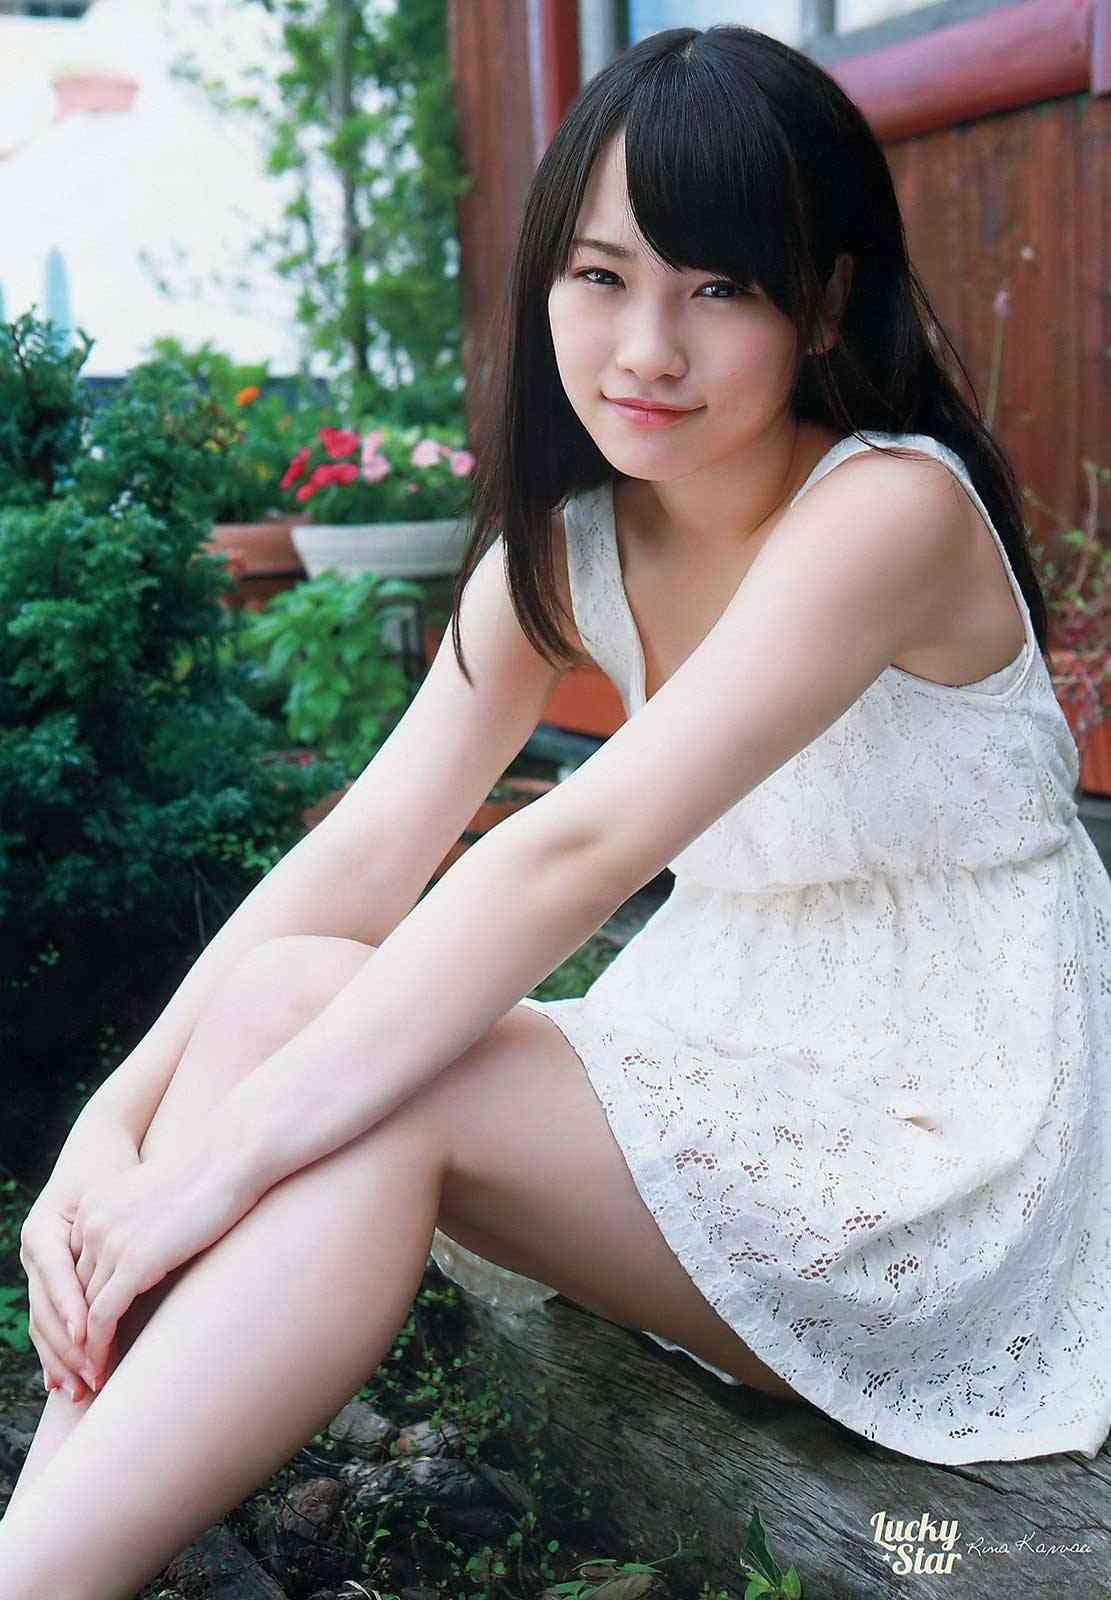 AKB48川栄李奈 卒業を発表 襲撃事件の傷癒えず